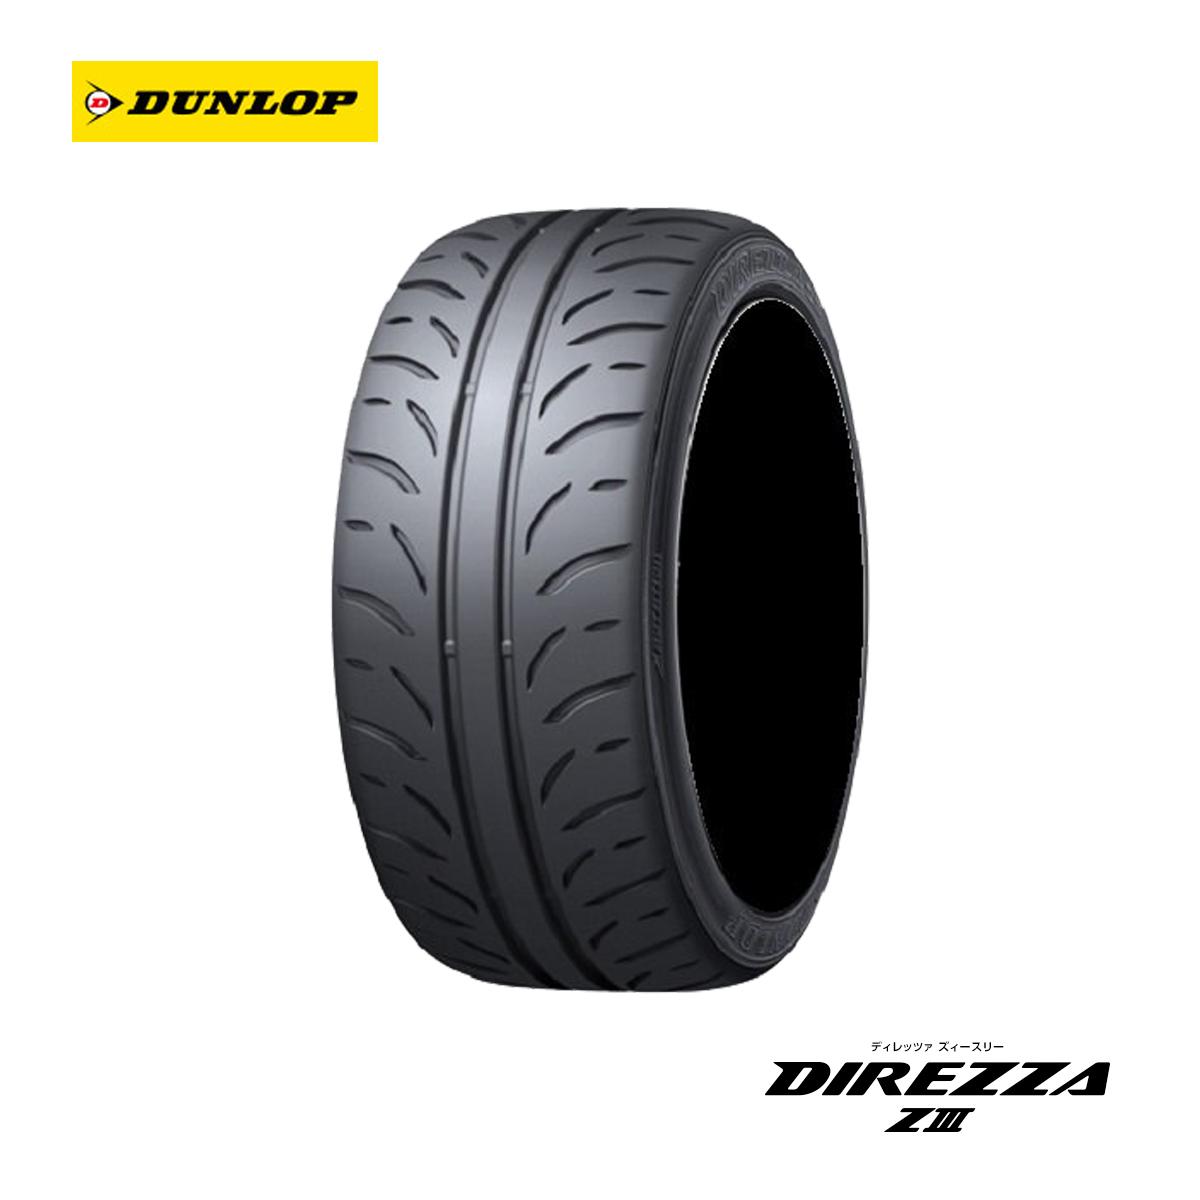 DUNLOP ダンロップ サマータイヤ 2本 18インチ 255/35R18 DIREZZA Z3 ディレッツァ